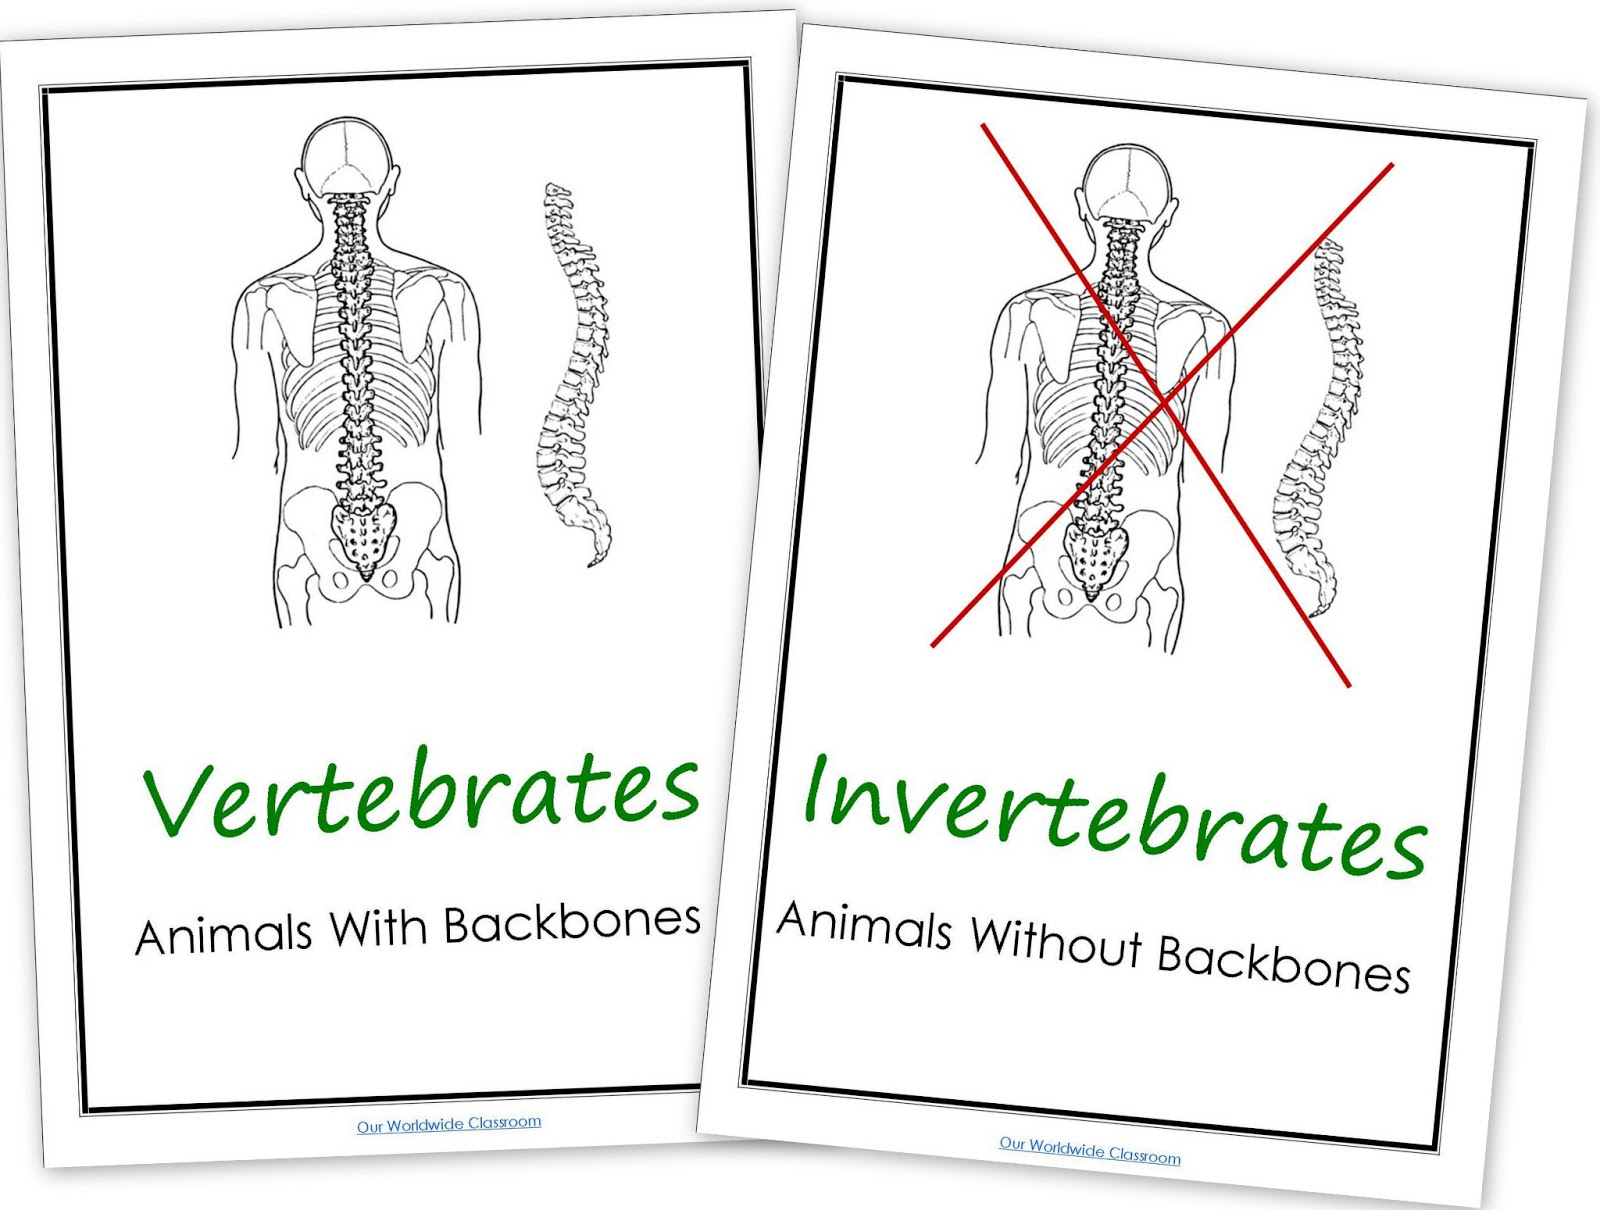 Worksheets Vertebrates And Invertebrates Worksheets amparos corner natural2 animals corner